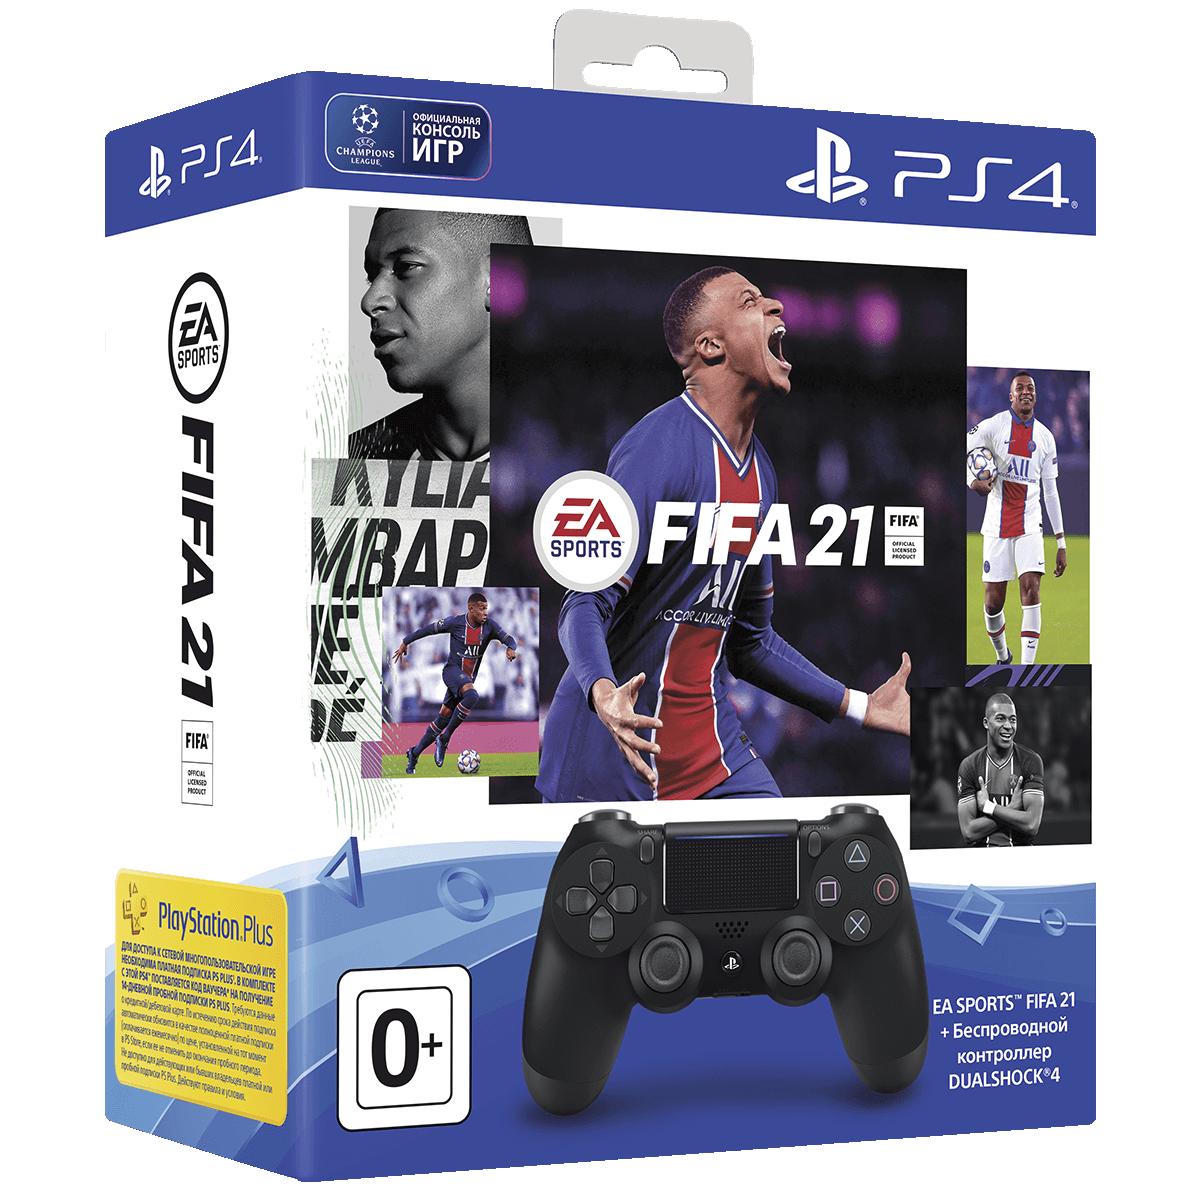 DS4 в стиле FIFA 21 – изображение комплекта